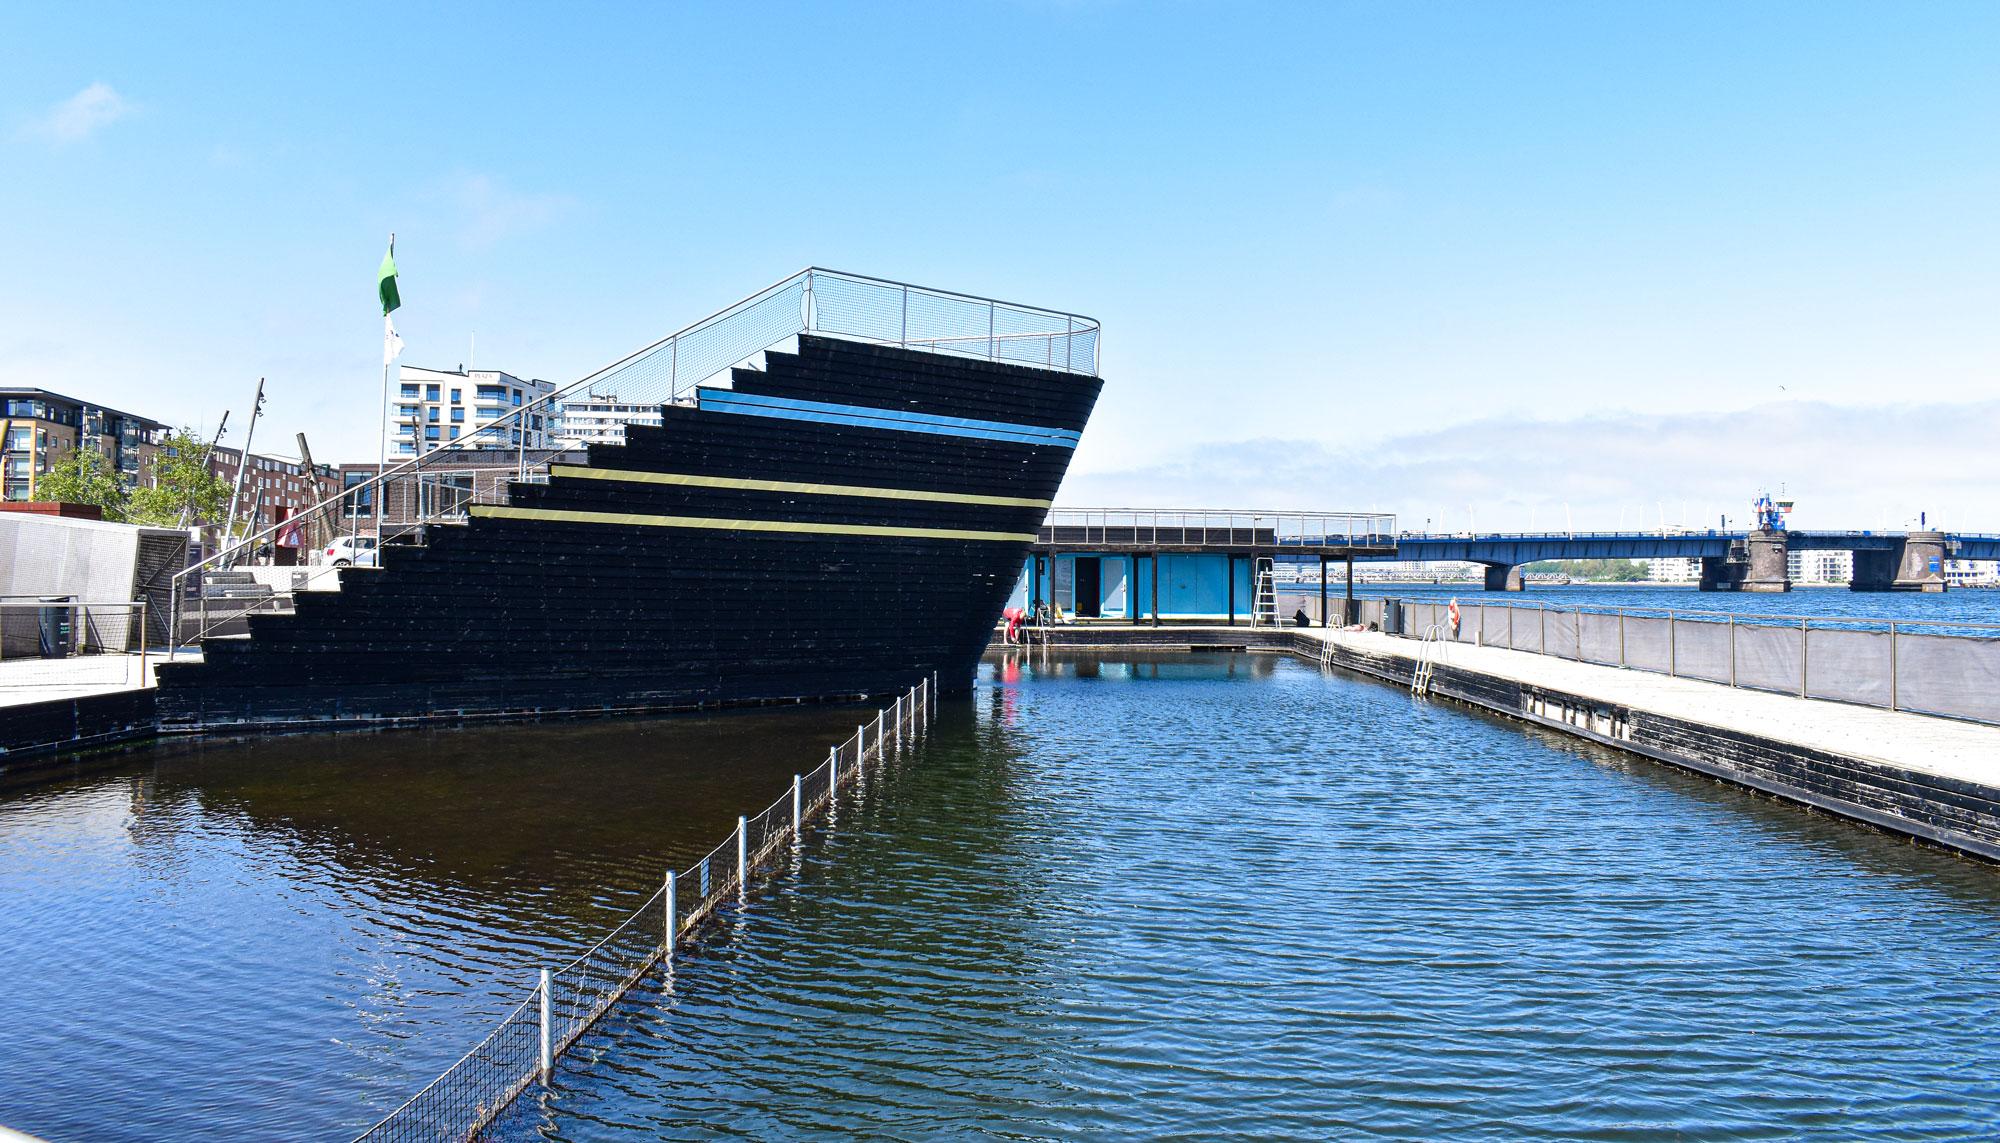 Klar på en dukkert?: Så varmt er badevandet i Aalborg